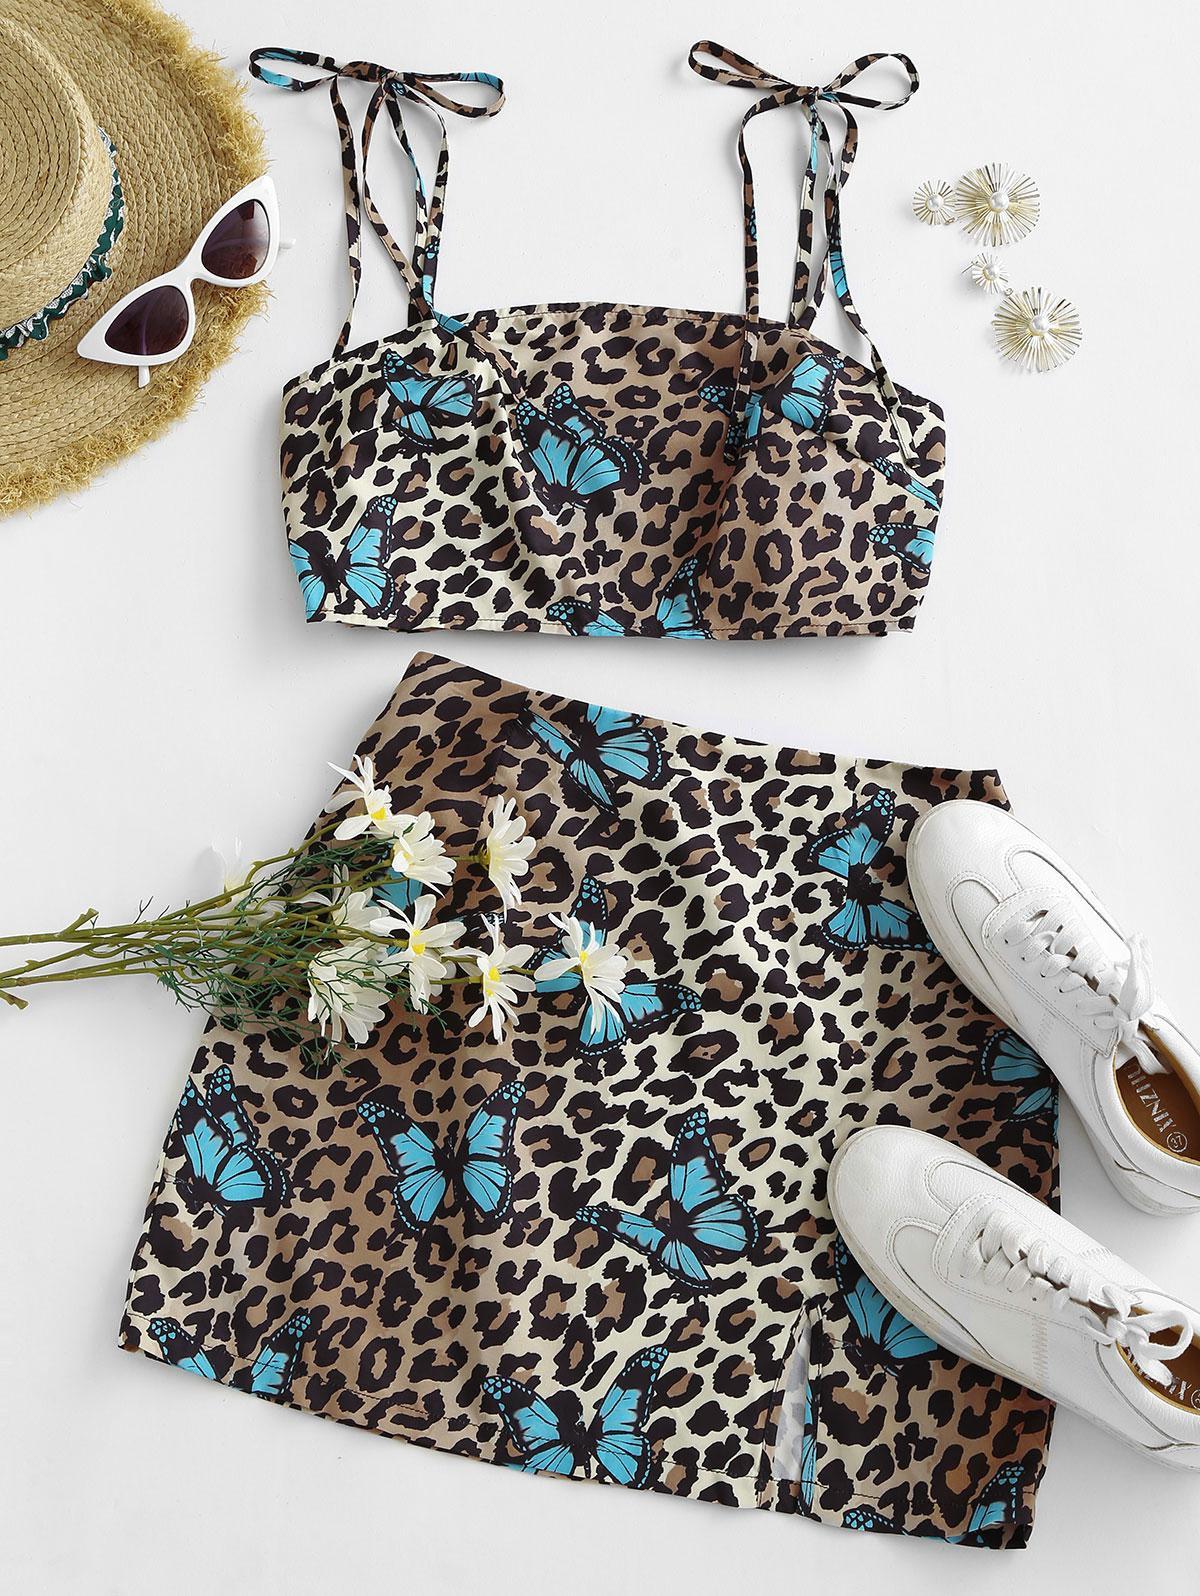 ZAFUL Leopard Butterfly Print Crop Top and Slit Skirt Set